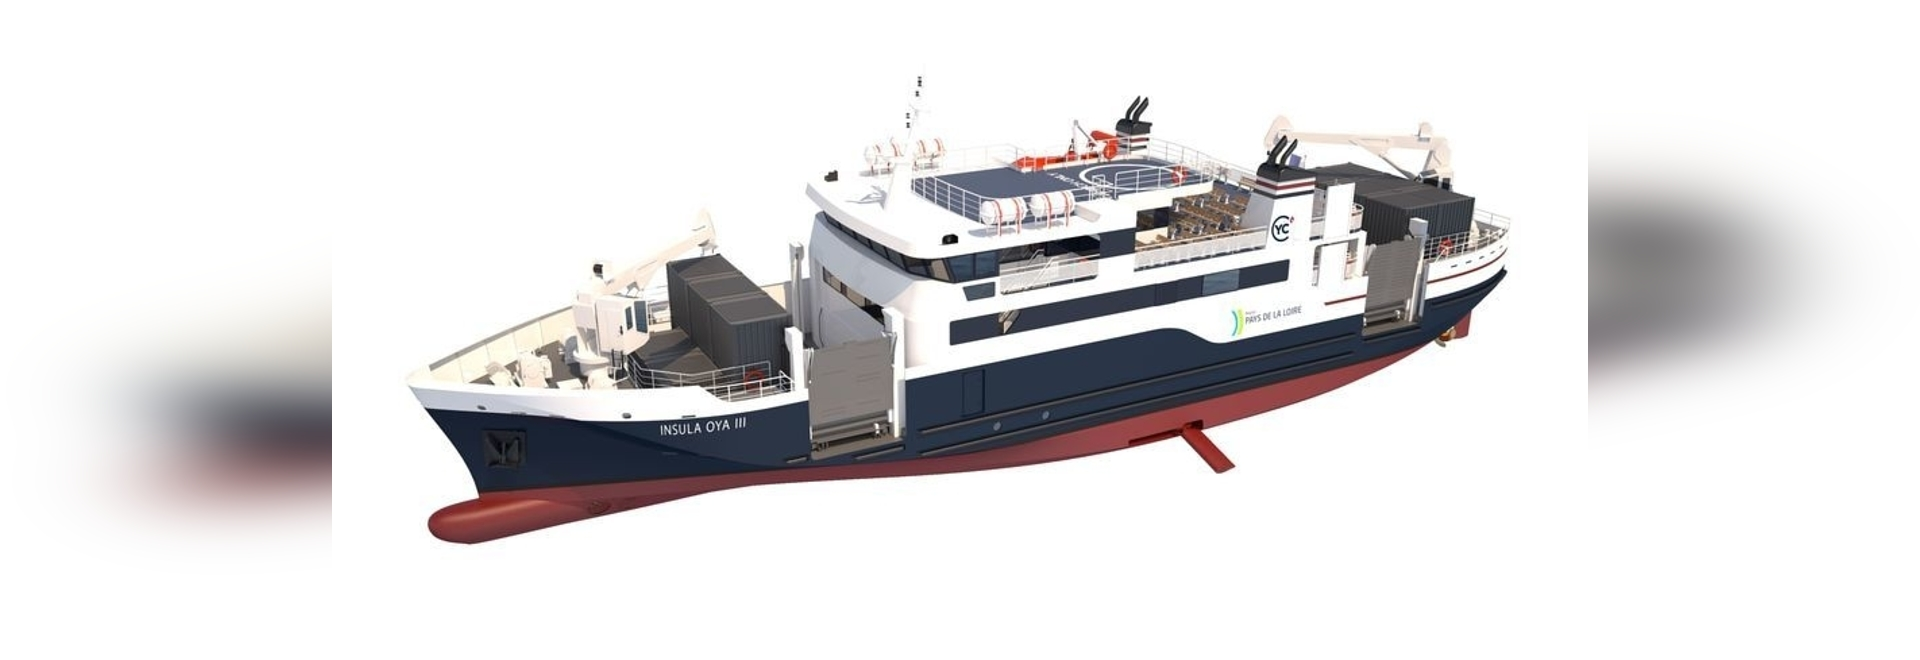 Vessel offers 40% increase in cargo capacity compared with predecessor